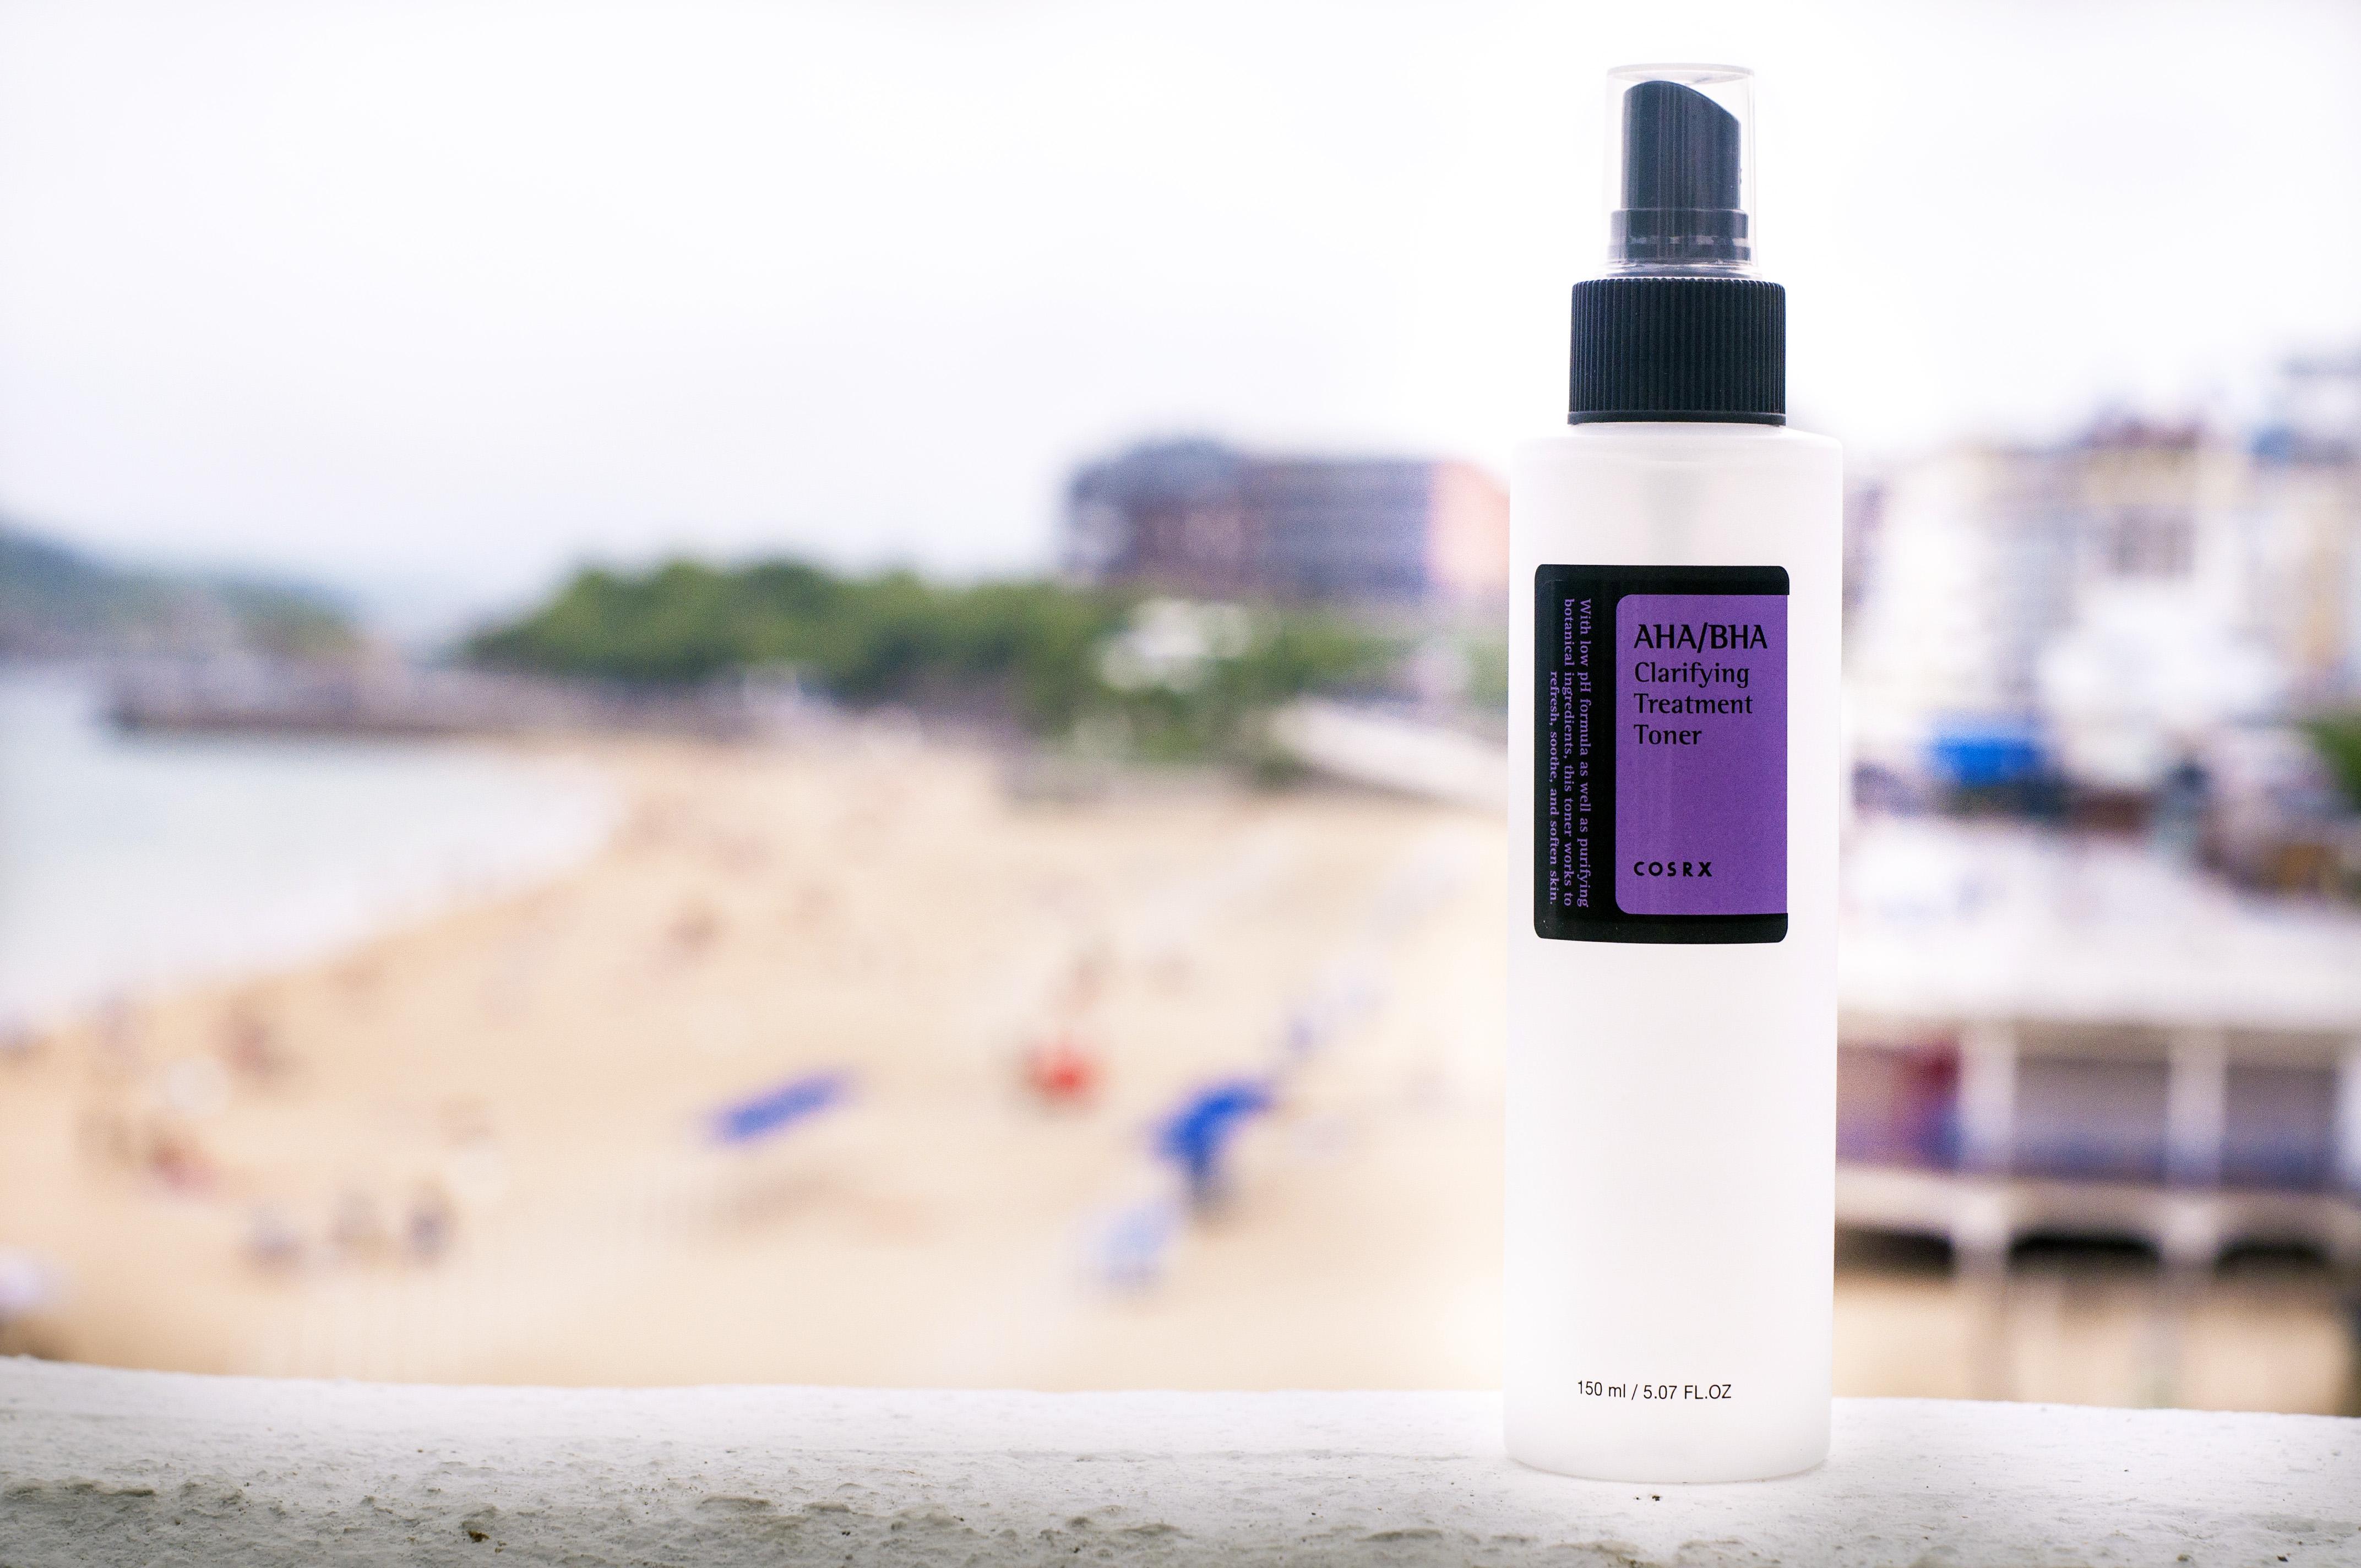 COSRX AHA/BHA Clarifying Treatment Toner Blueberry Cosmetics ácidos para el cuidado de la piel